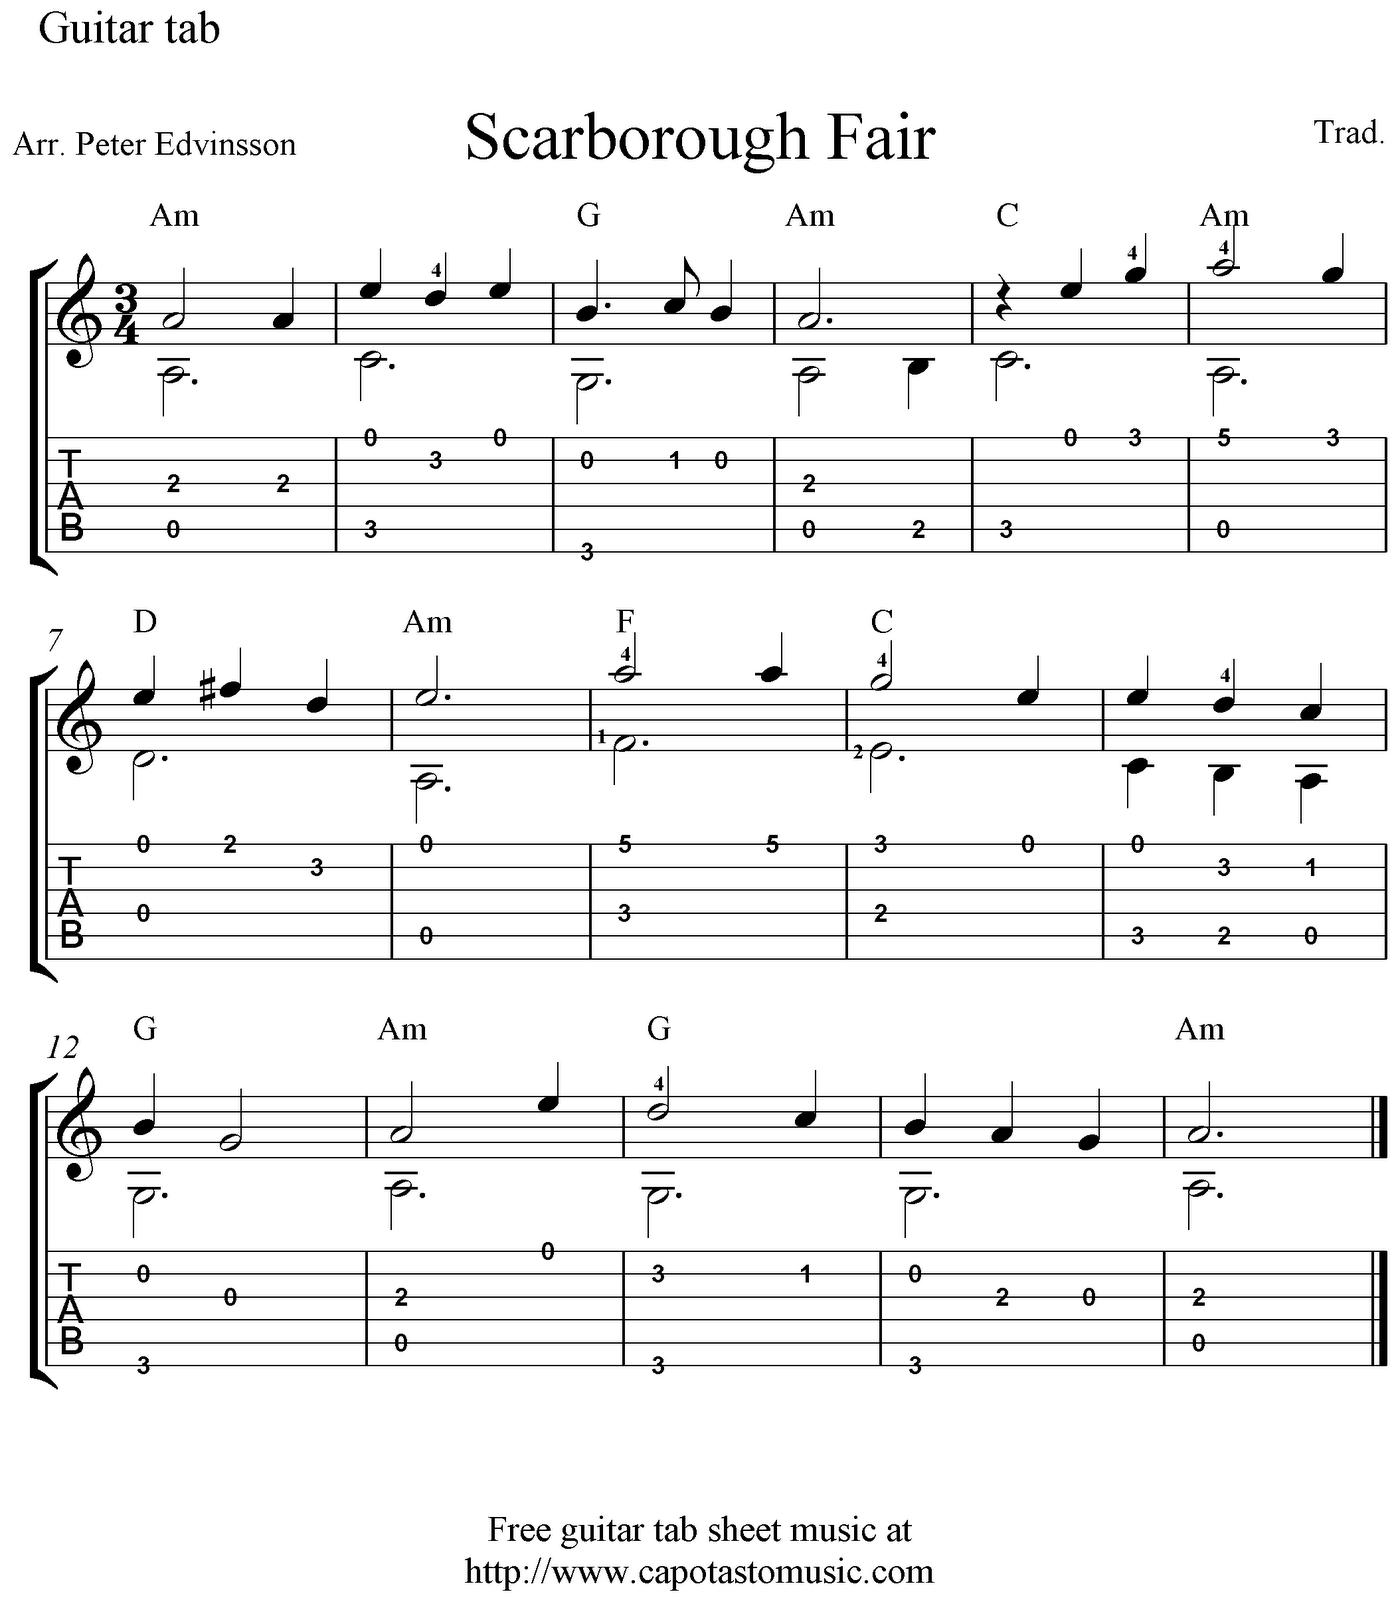 Free Easy Piano Sheet Music Score Scarborough Fair: Scarborough Fair, Free Guitar Tablature Sheet Music Solo